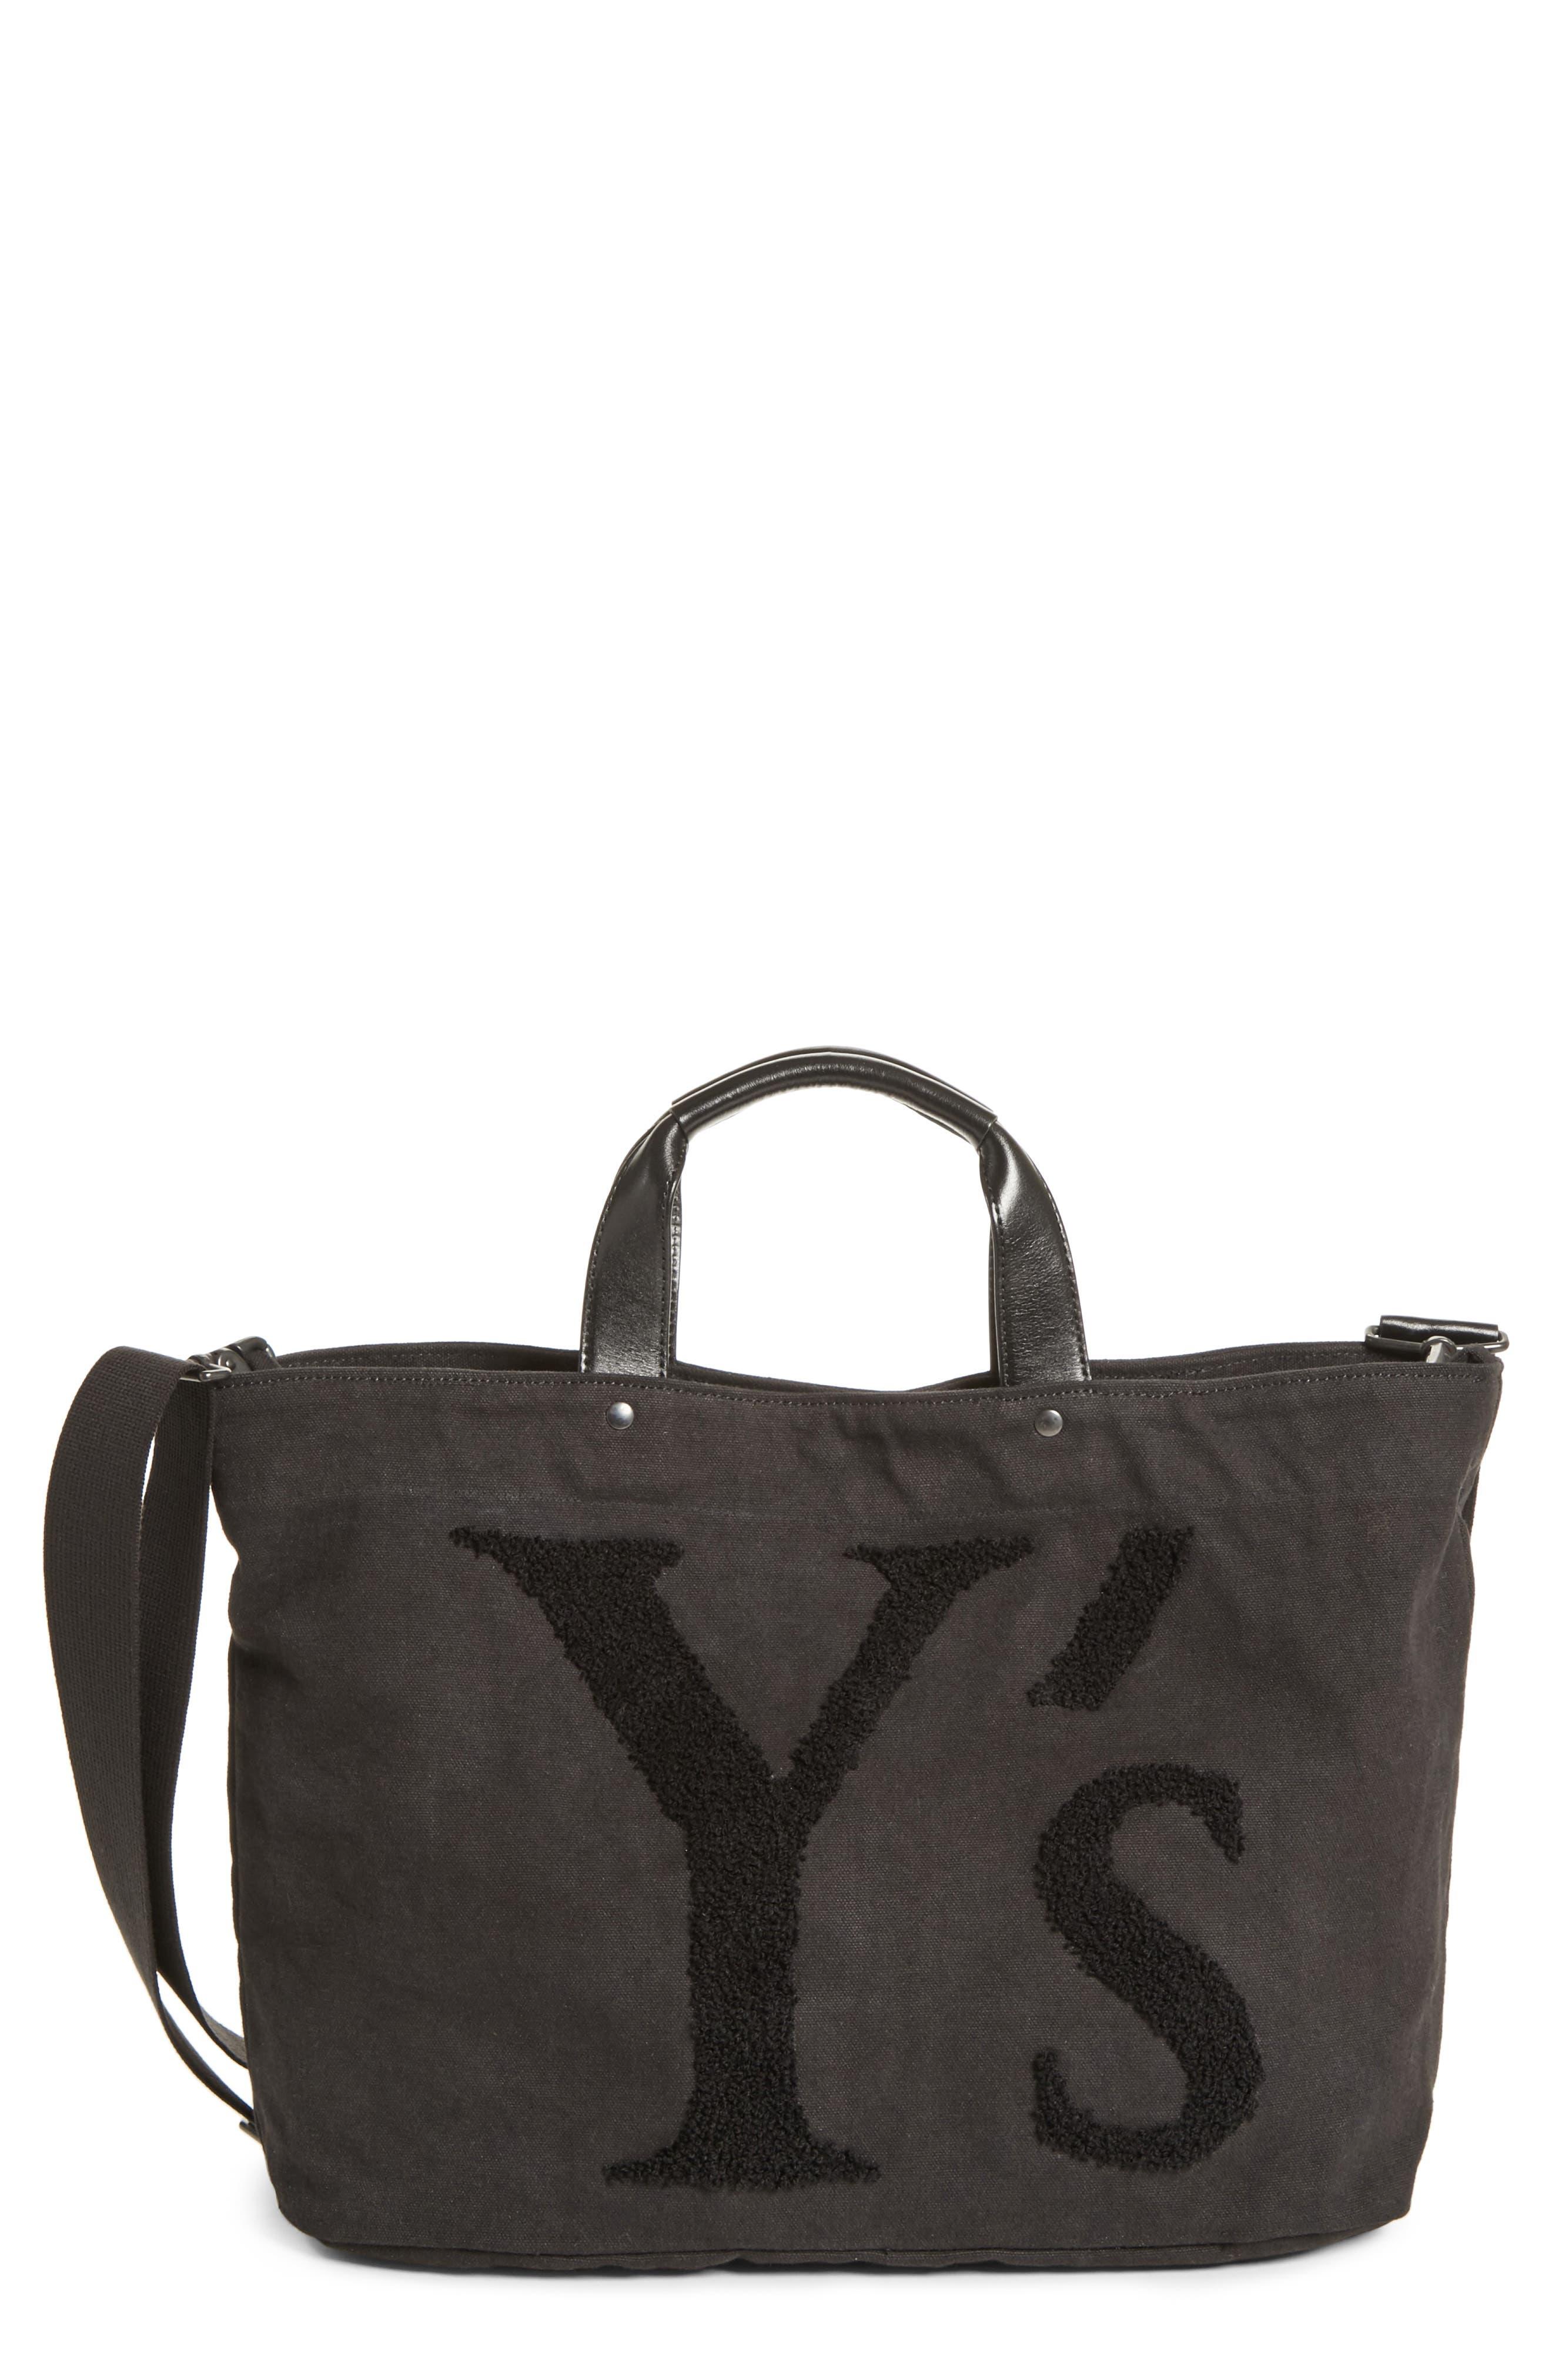 Ys By Yohji Yamamoto Embroidered Canvas Tote Bag - Black